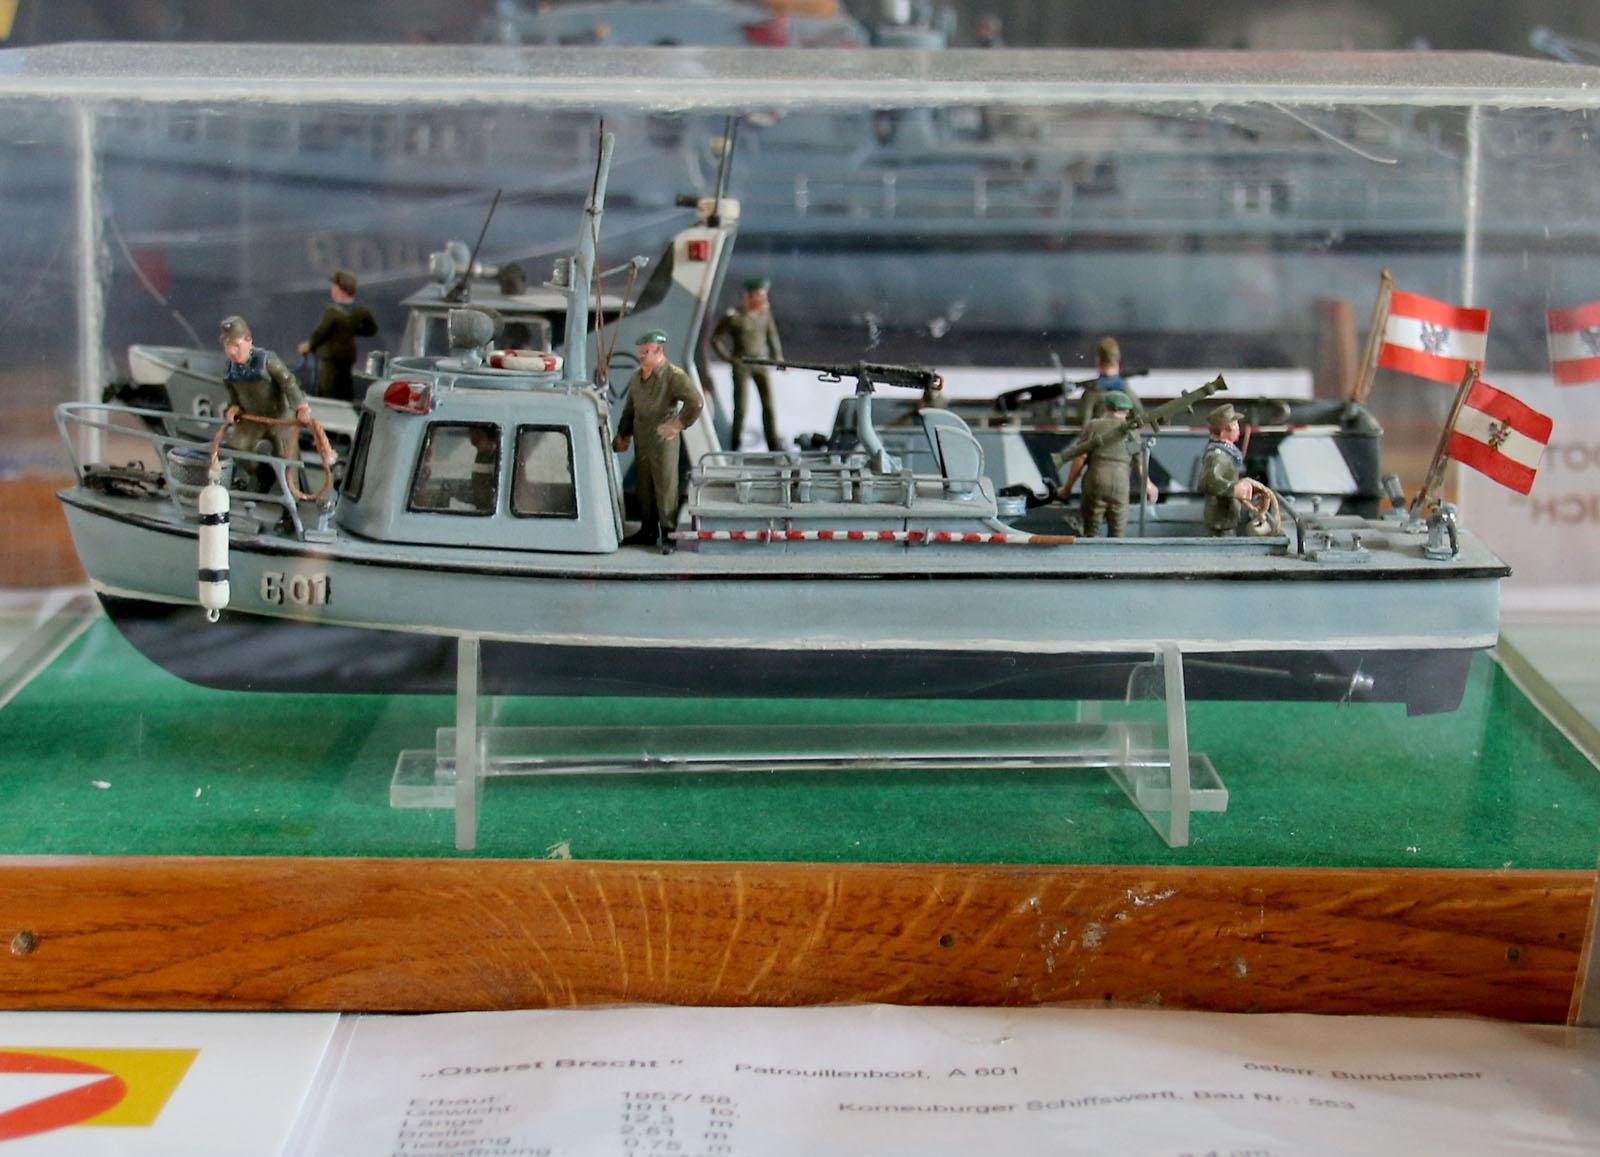 Patrouillenboot Oberst Brecht vor dem Umbau, dahinter nach dem Umbau © Doppeladler.com